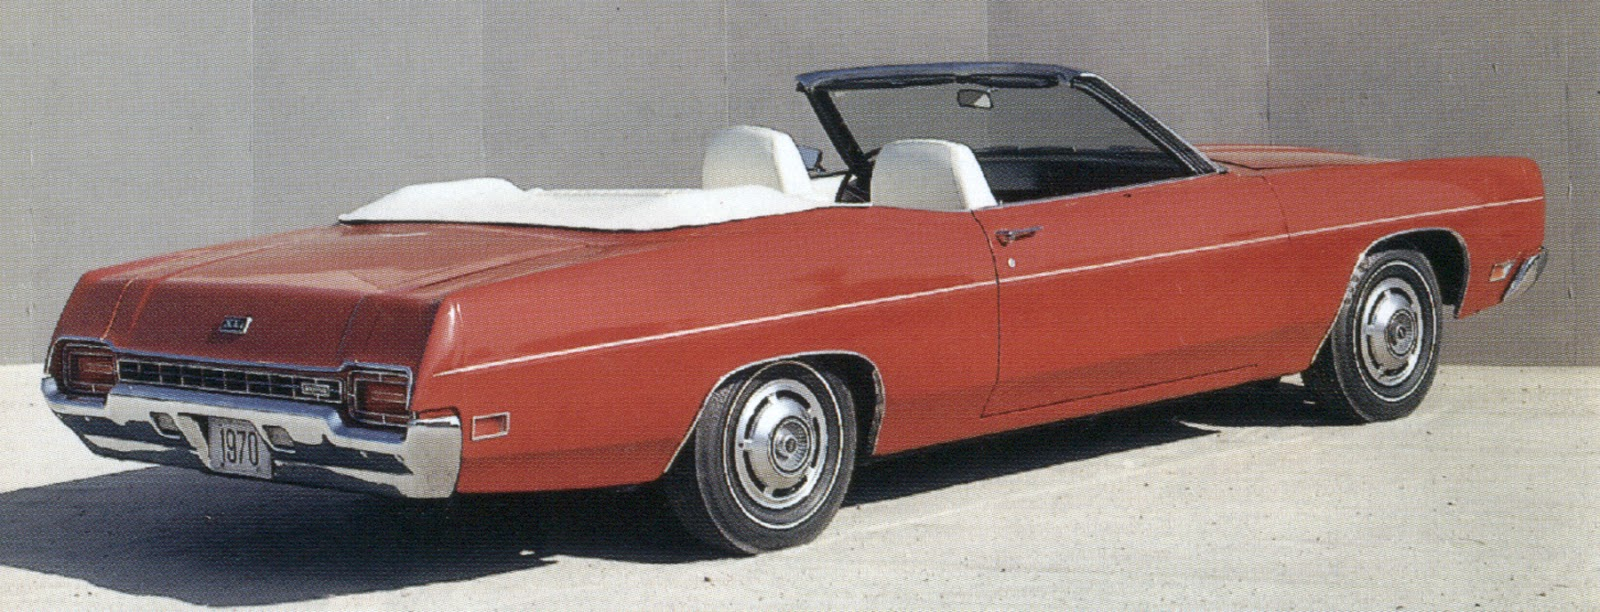 the 1968 1970 ford xl gt cars phscollectorcarworld rh phscollectorcarworld blogspot com 1970 Ford LTD Brougham 1970 Ford LTD Interior